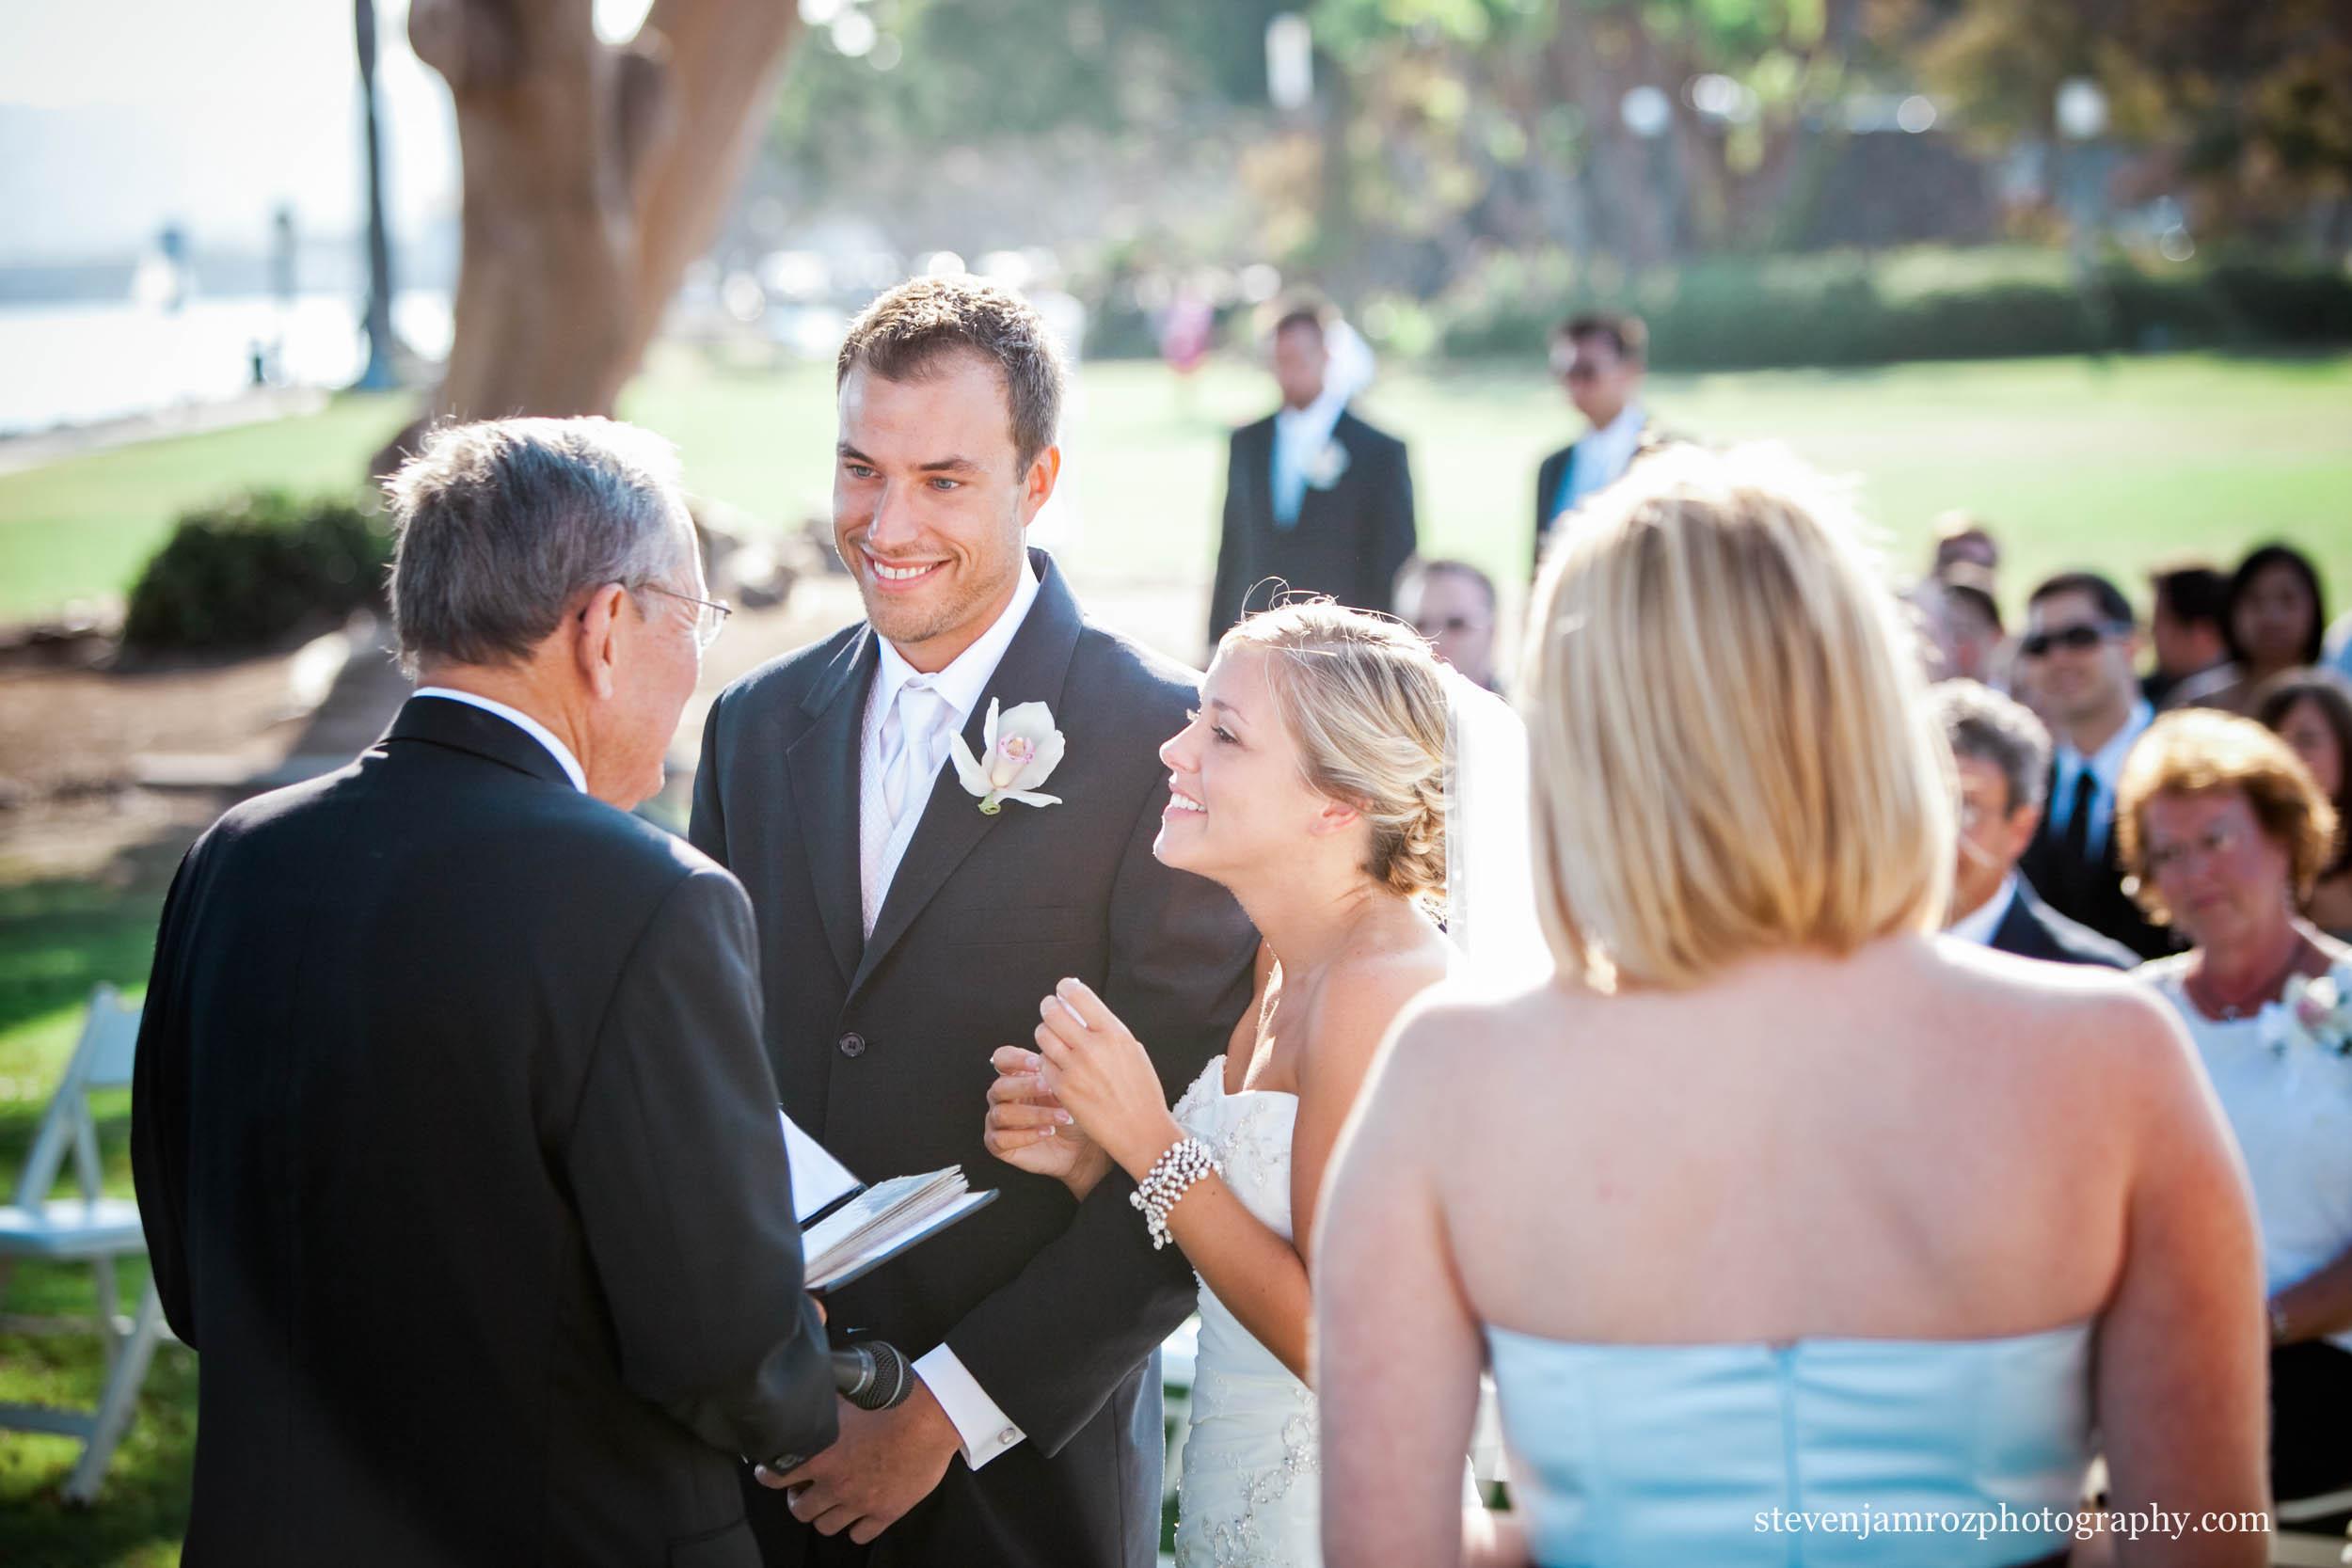 afternoon-wedding-bride-groom-photographer-steven-jamroz-0717.jpg